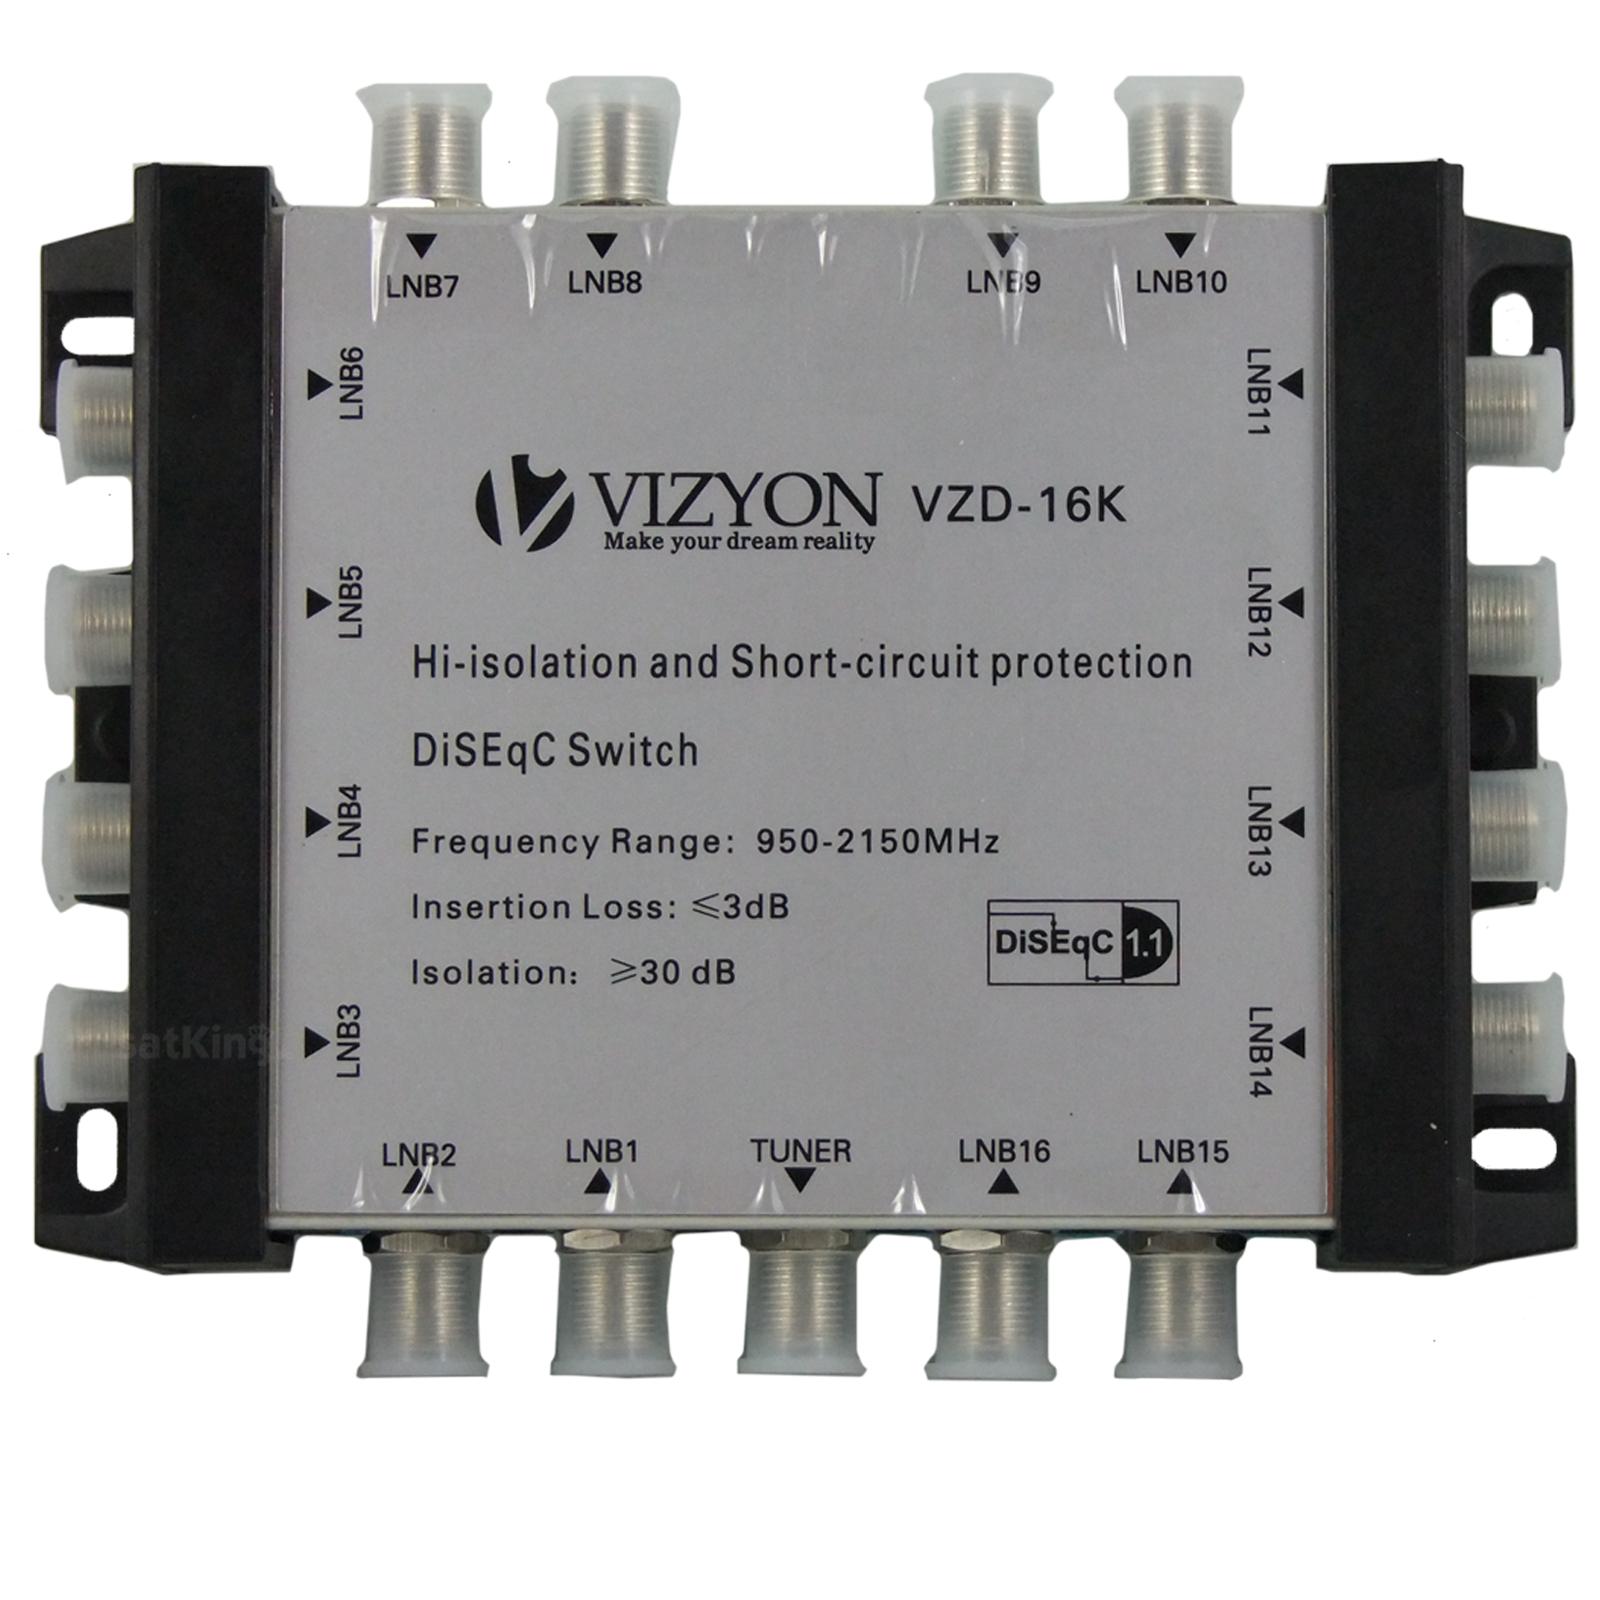 Vizyon VZD-16K DiSEqC Schalter 16/1 (16 in/1 out) ++ SatKing